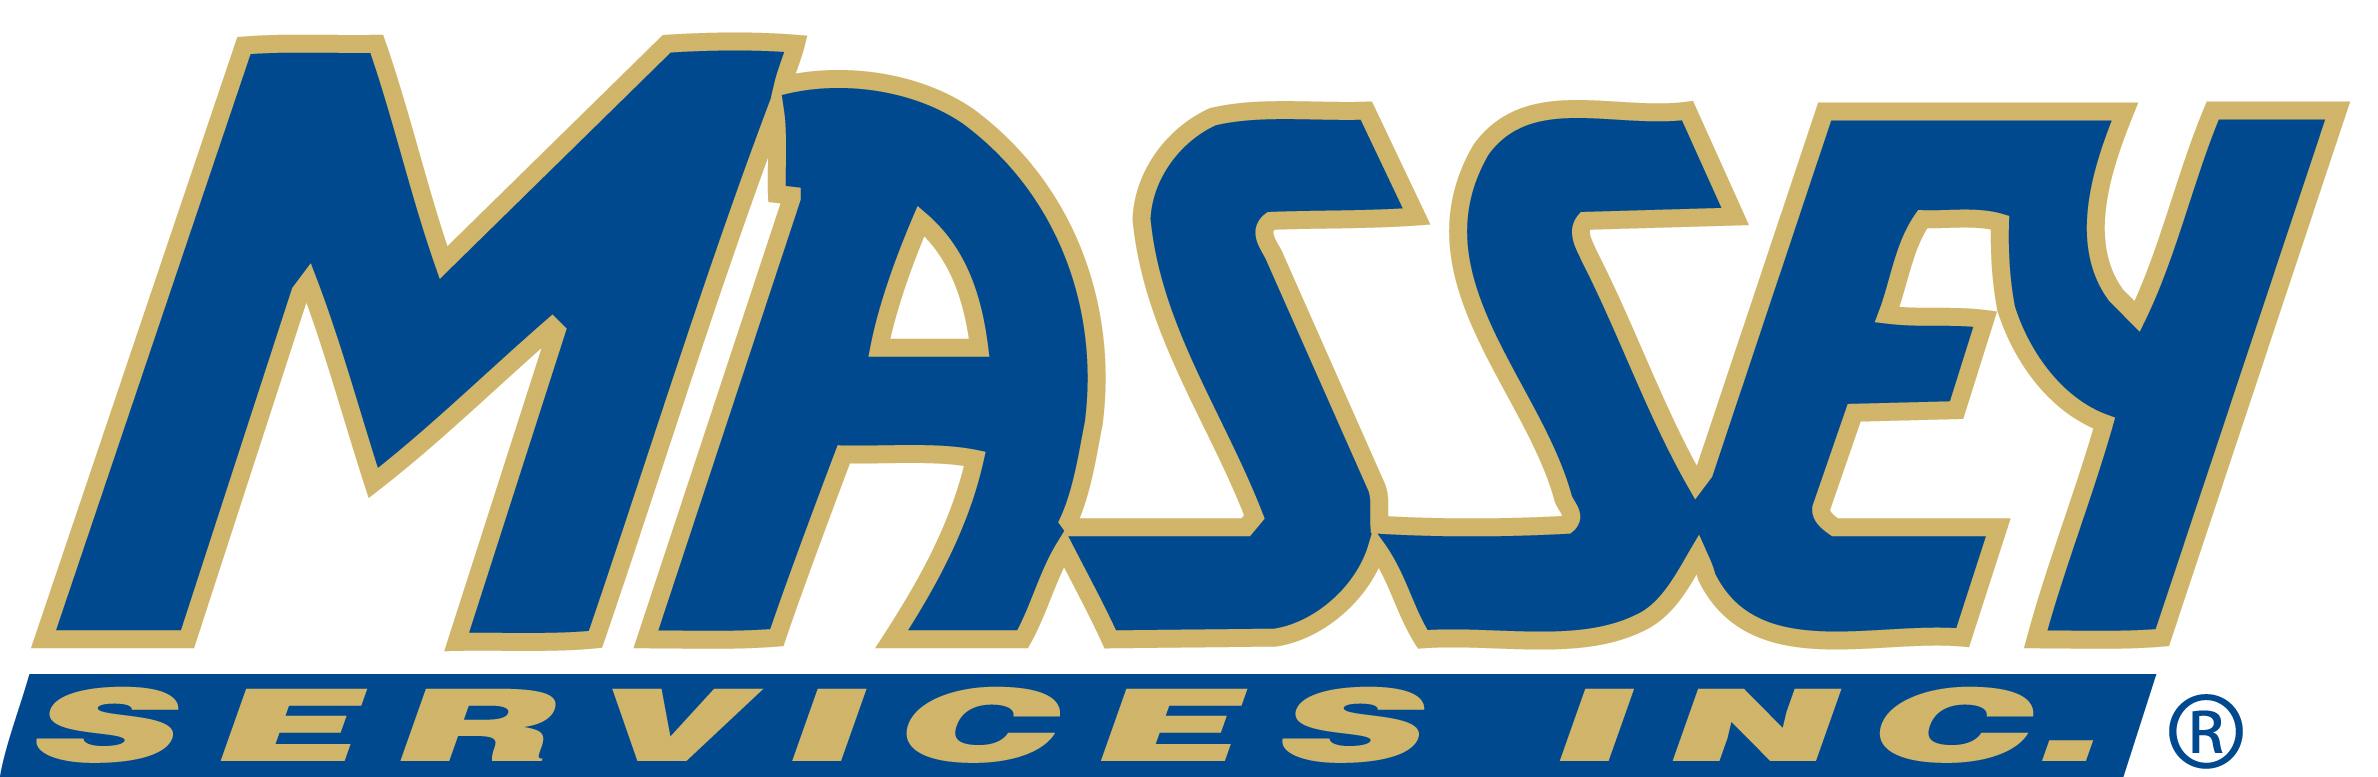 Massey Services Inc